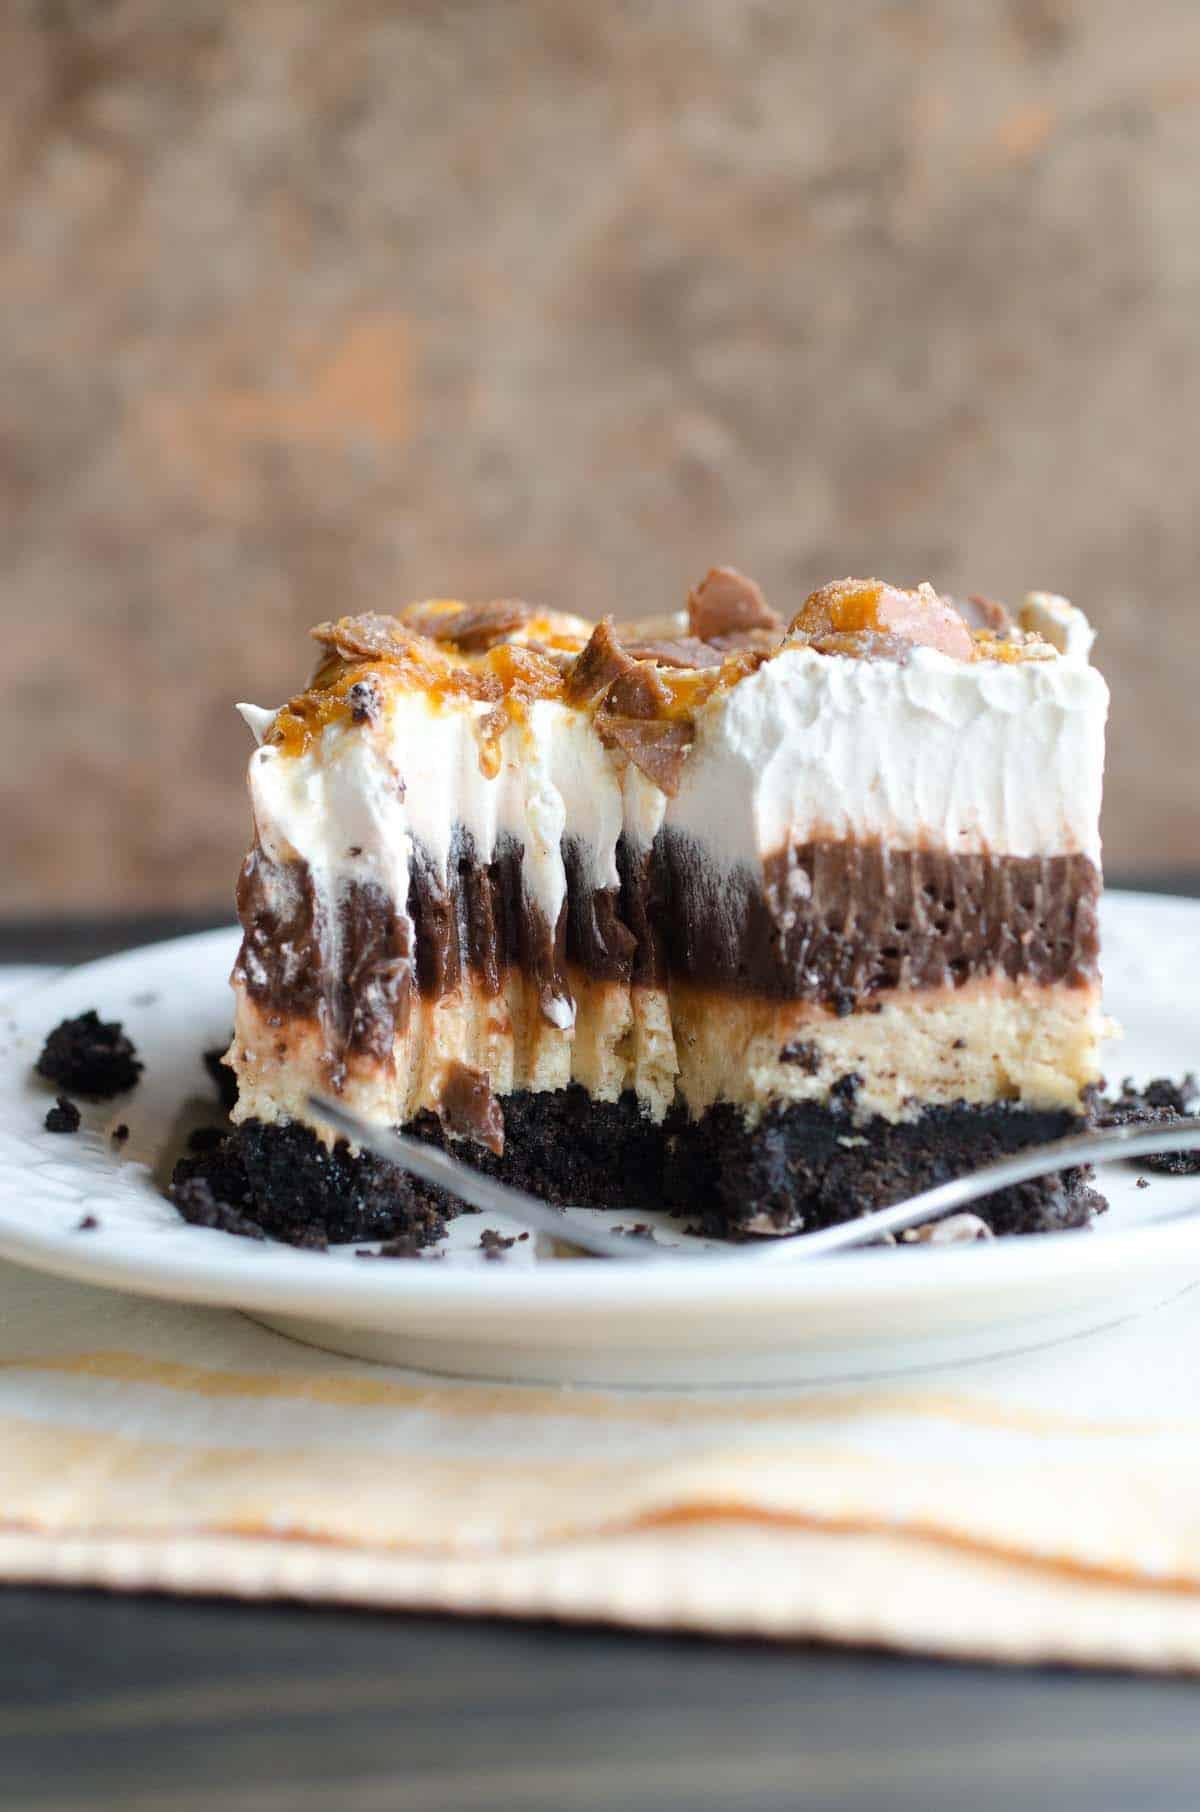 layered chocolate dessert with oreo crust